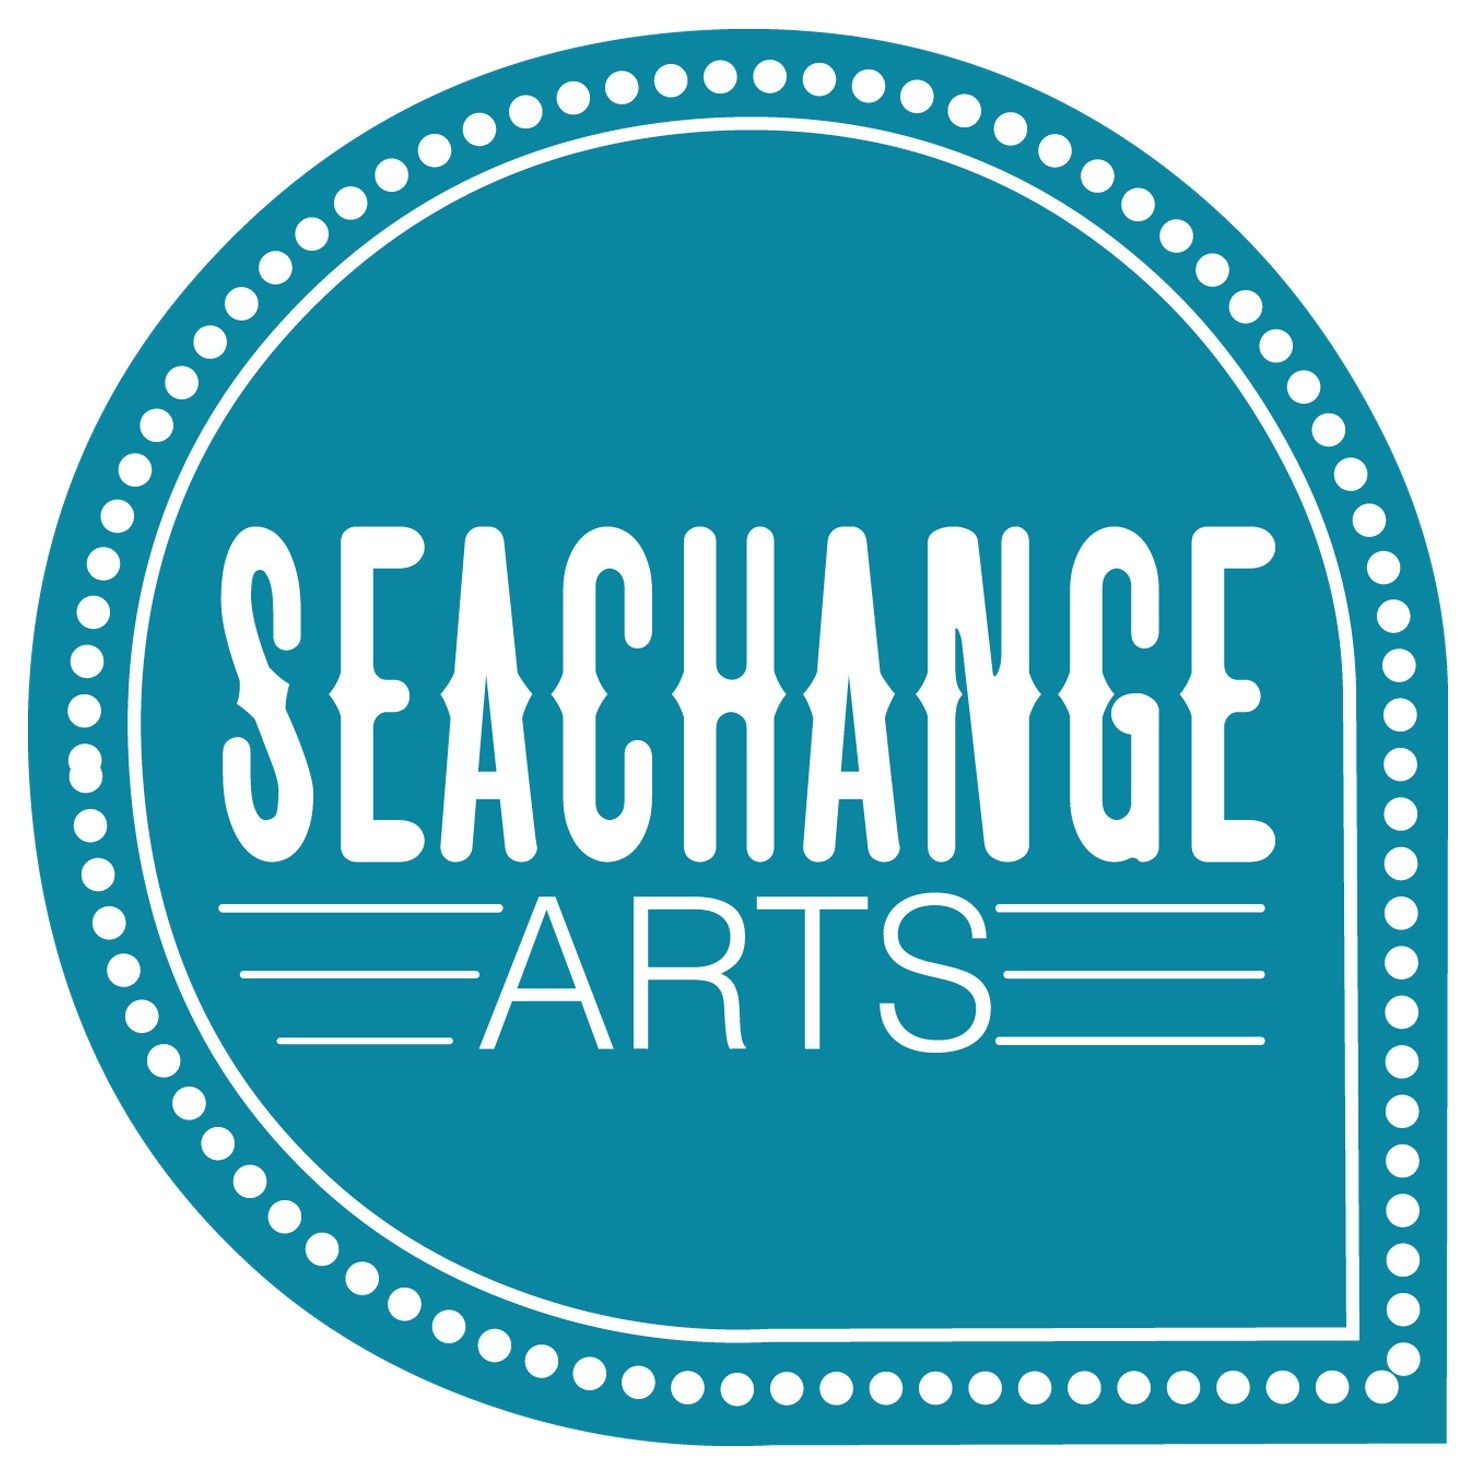 4090-logo-seachange-arts.jpg